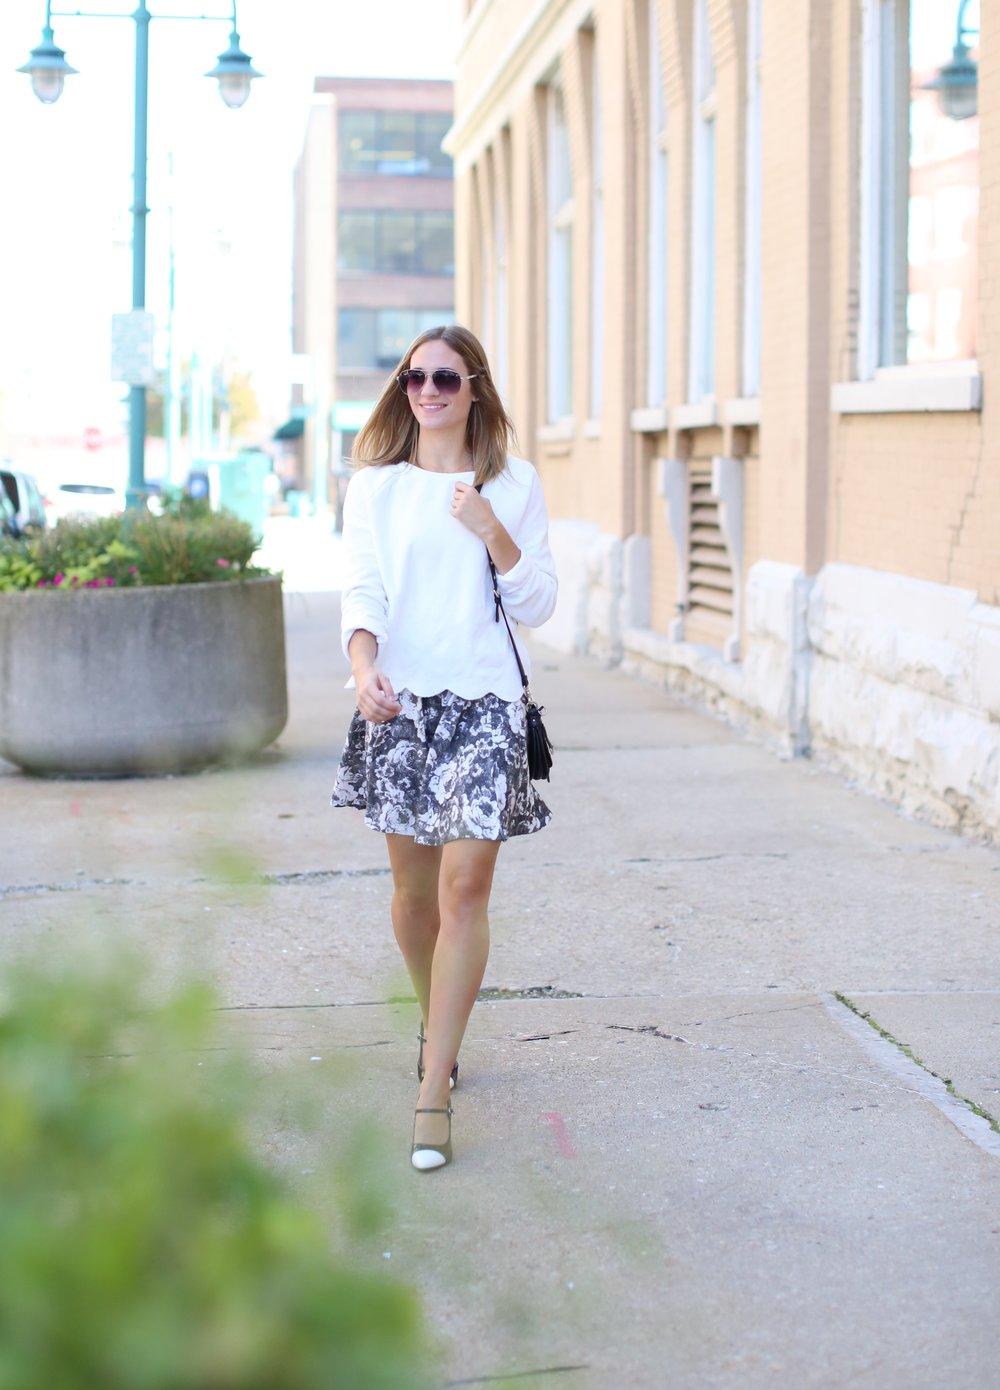 Black + White Outfit | Katelyn Now